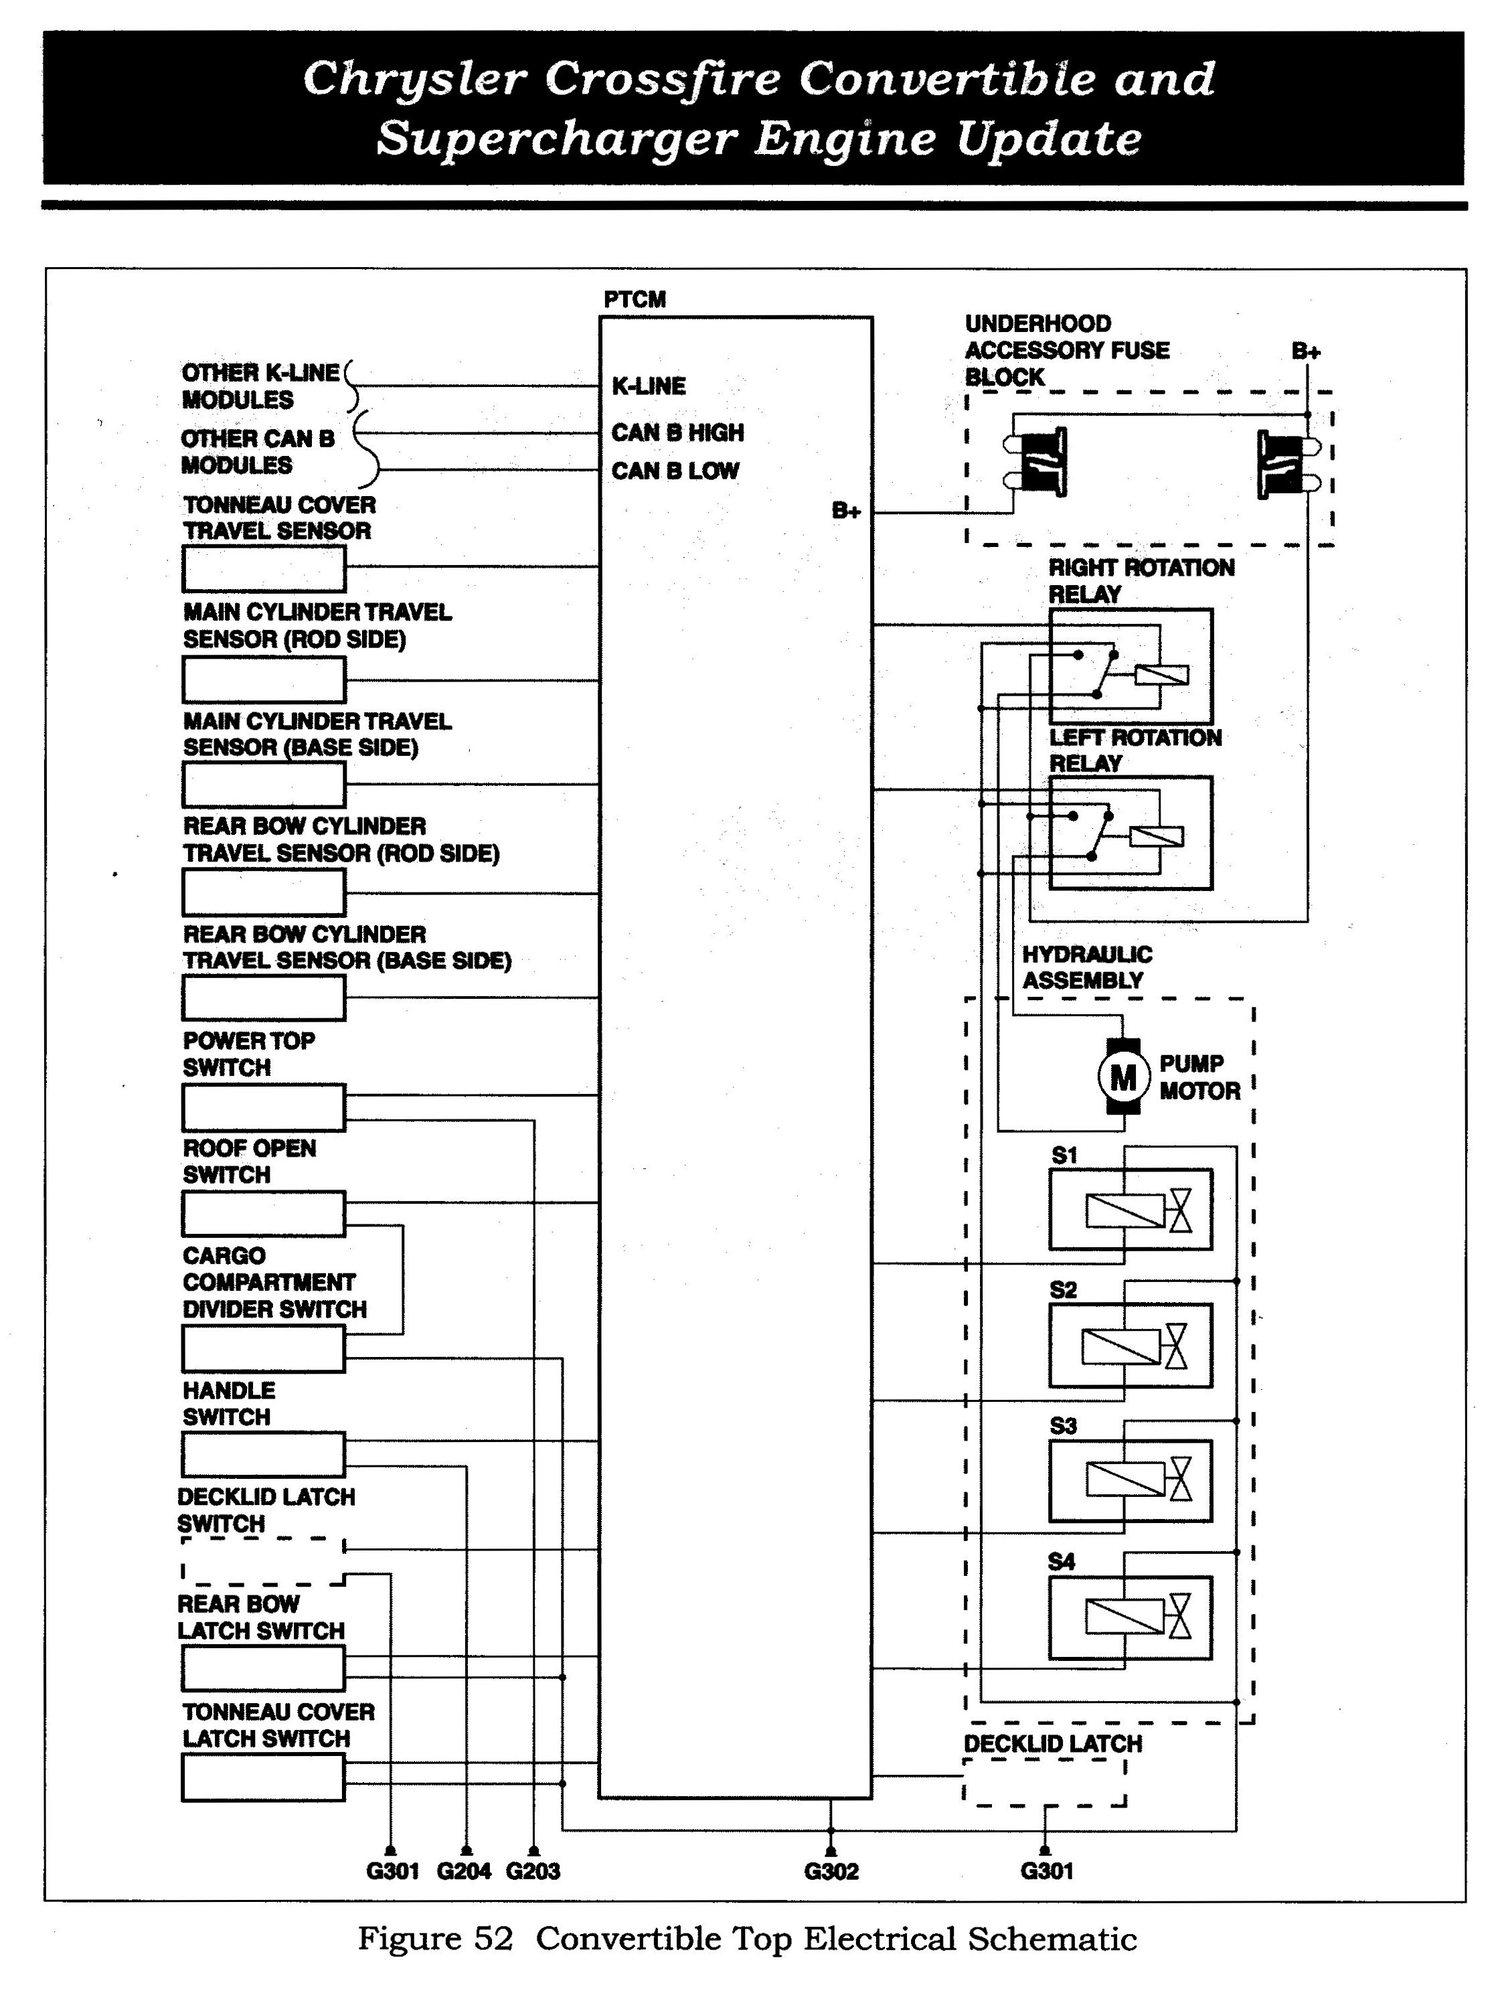 hight resolution of  conv top wiring diagram crossfireforum the chrysler crossfire on 2006 chrysler 300 wiring